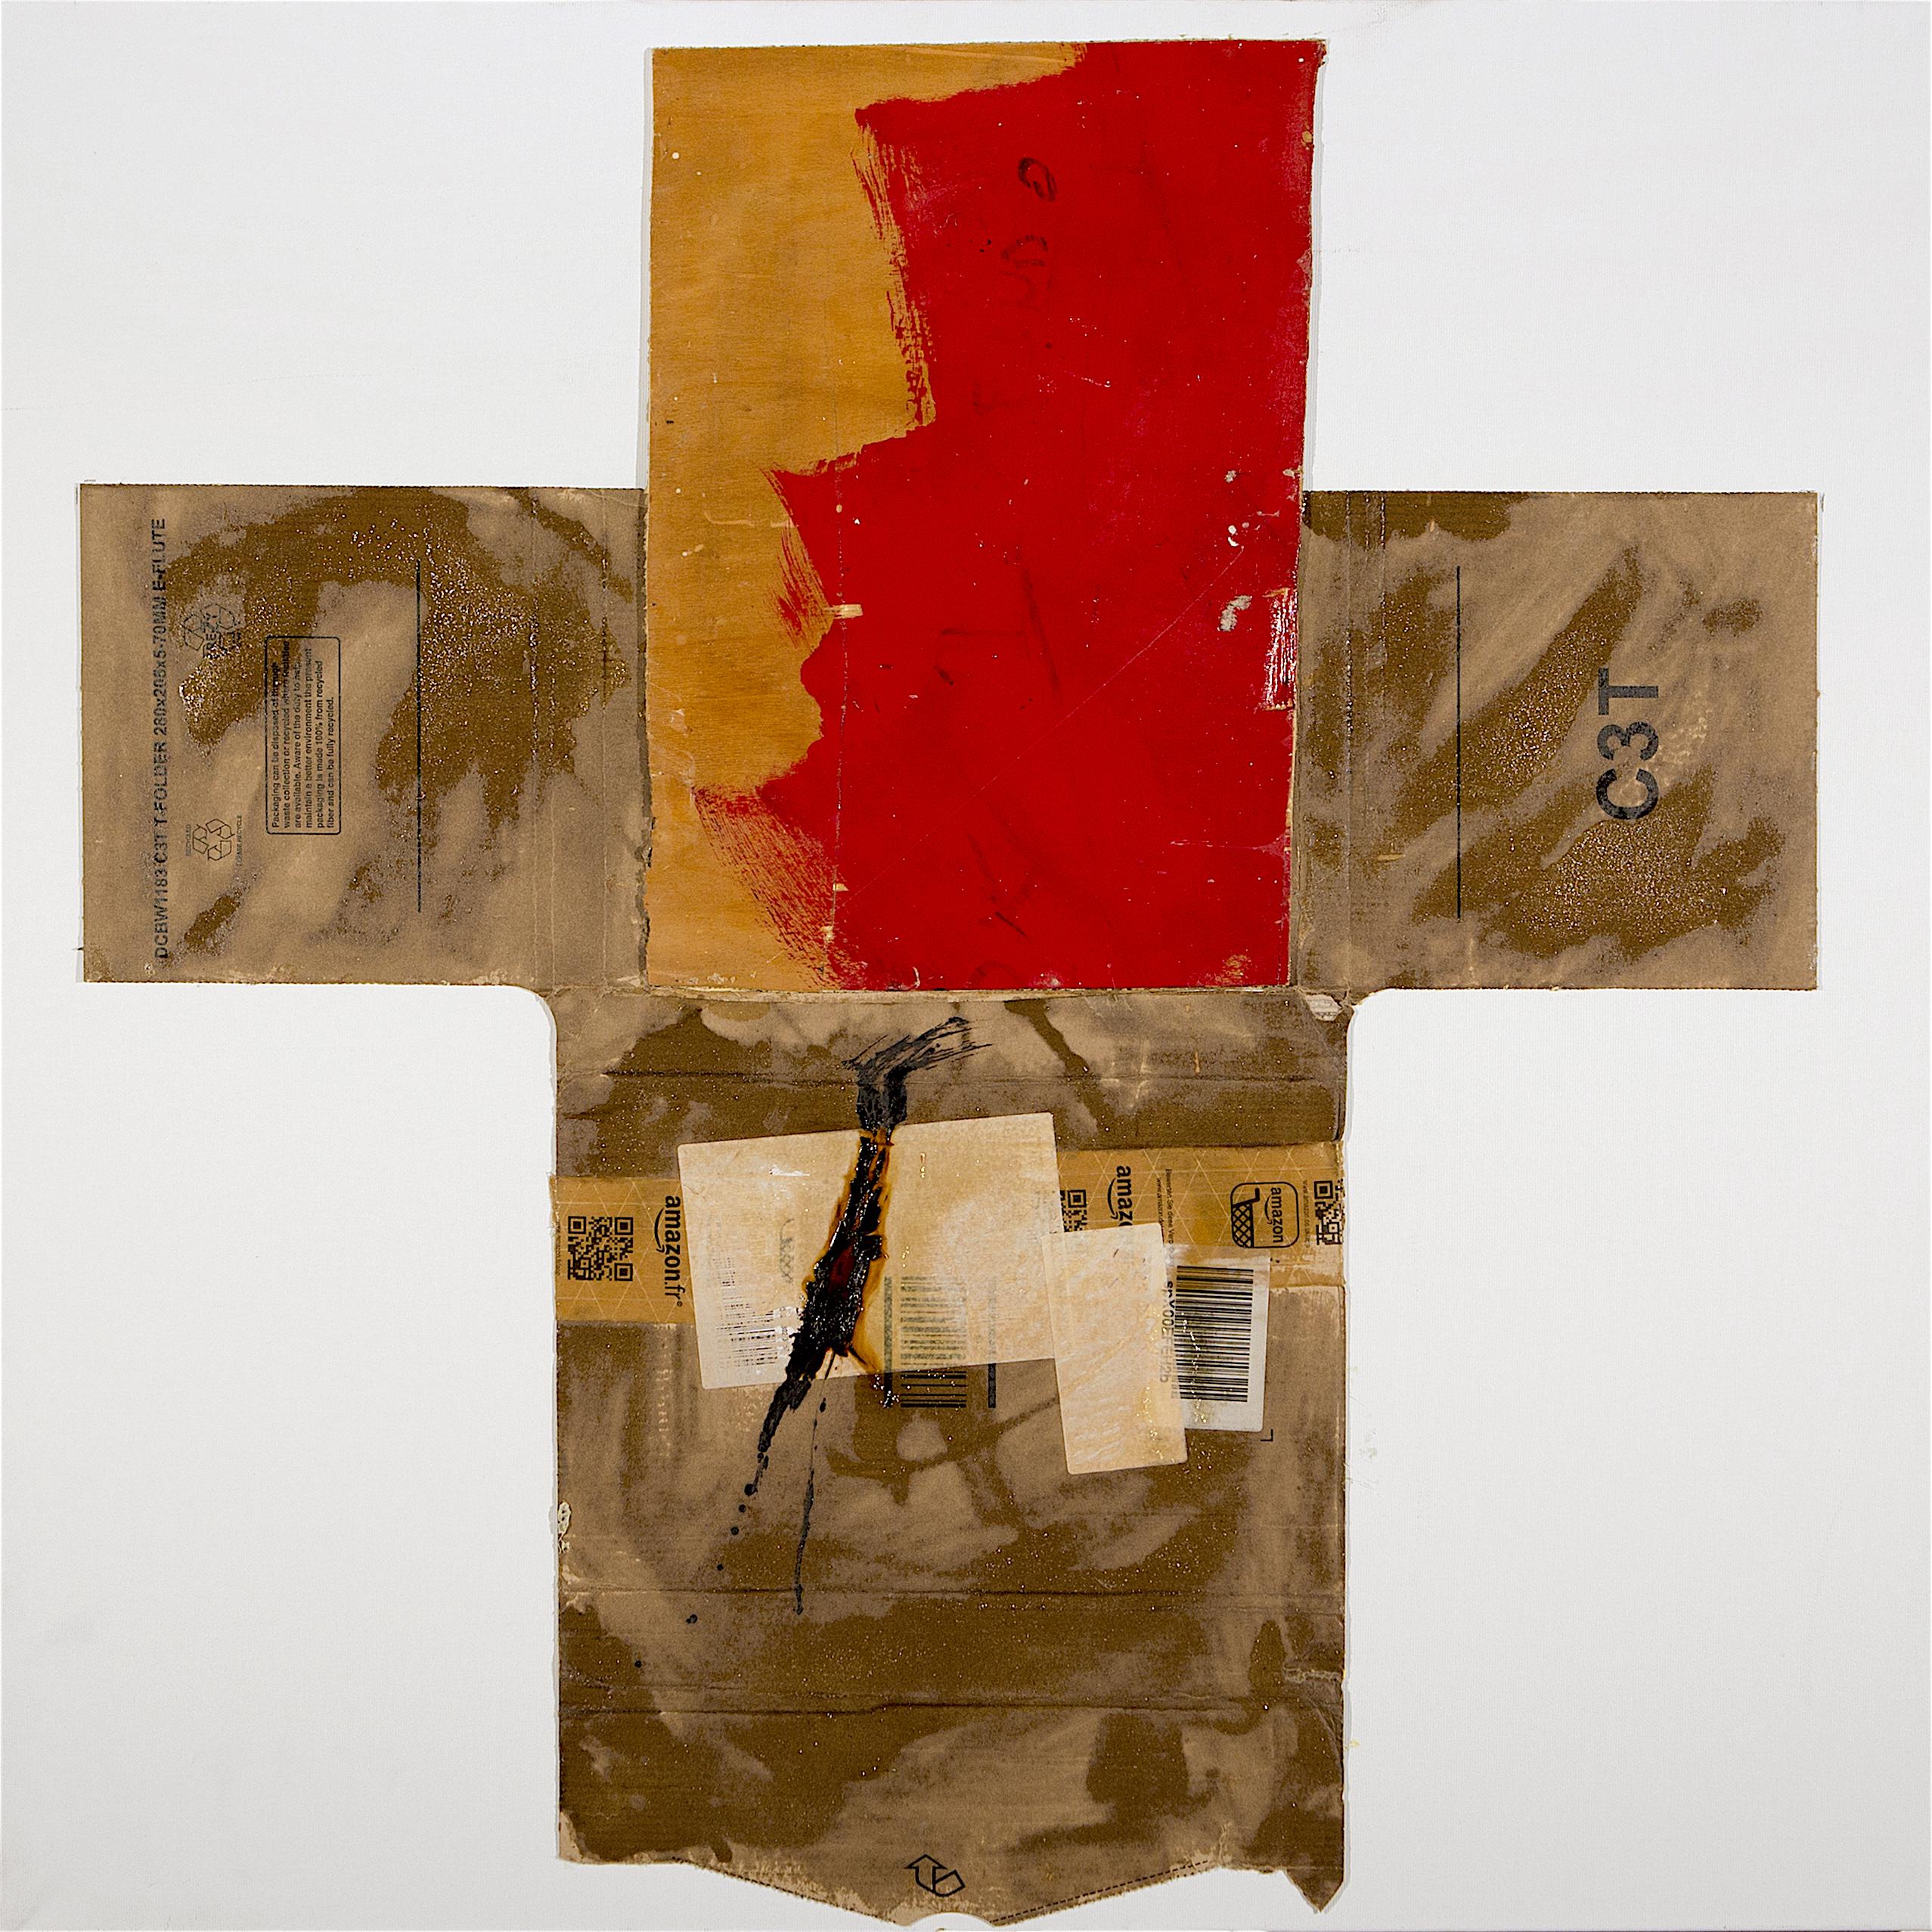 AP Ec 1_2, 2015, tecnica mista, cartone e legno su tela, cm 80 x 80